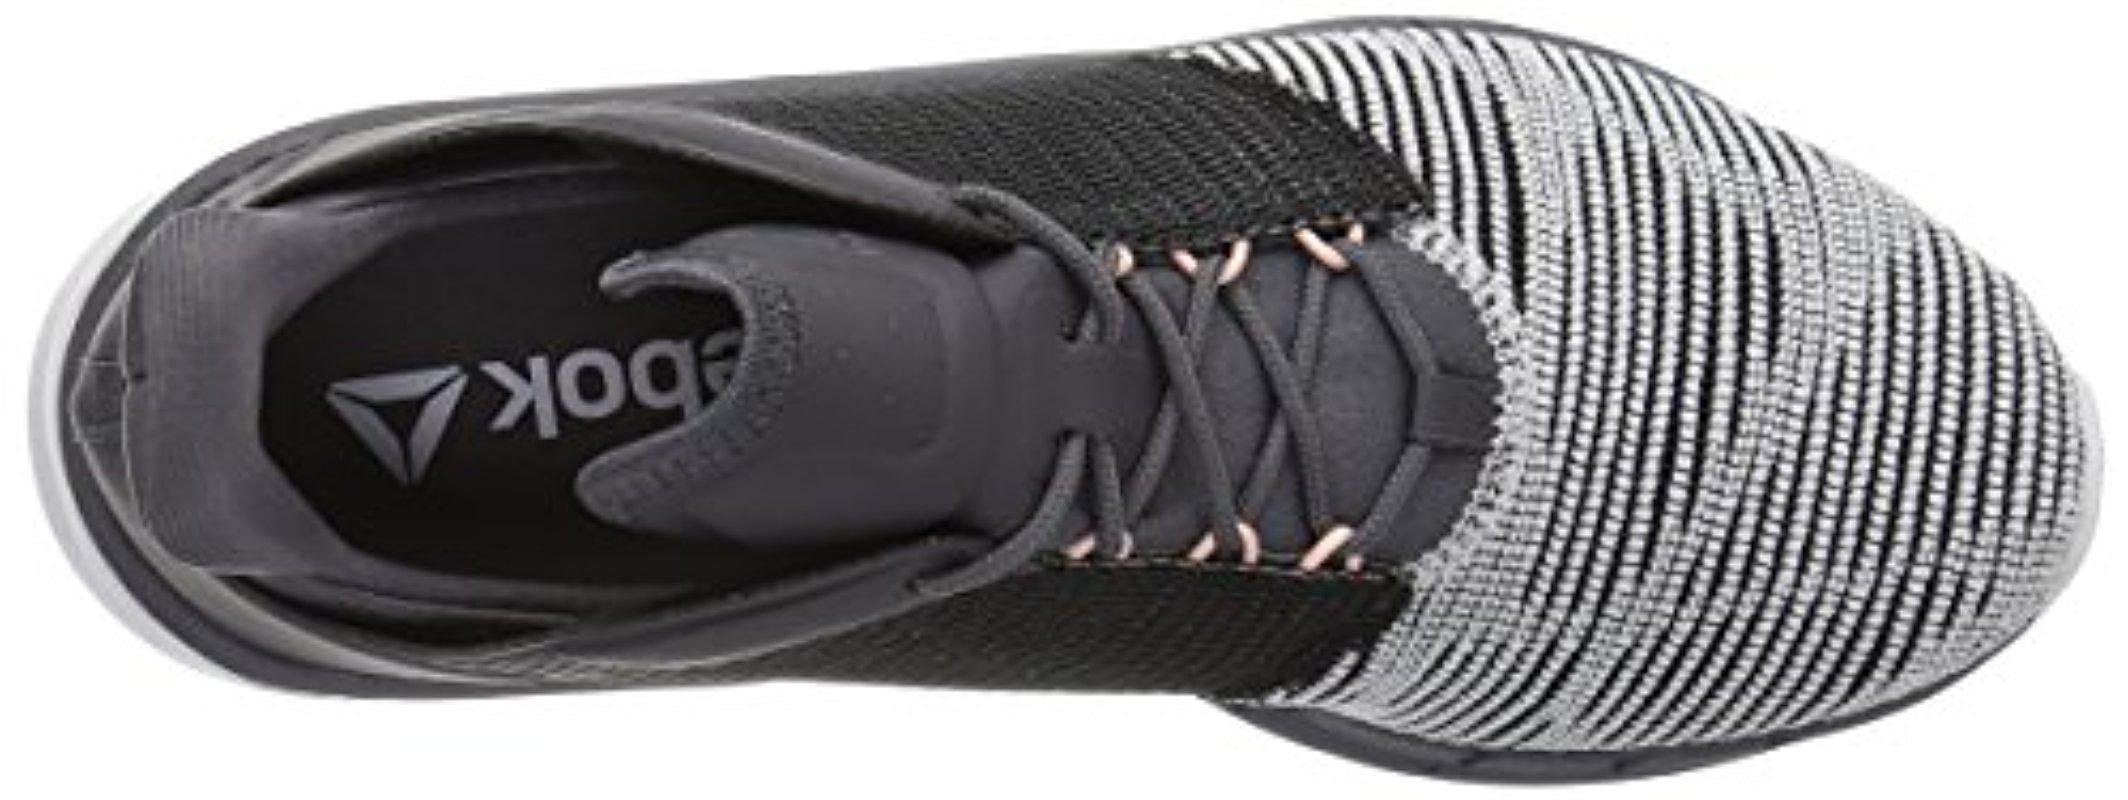 3befd89e4b7b50 Lyst - Reebok Fast Flexweave Running Shoe